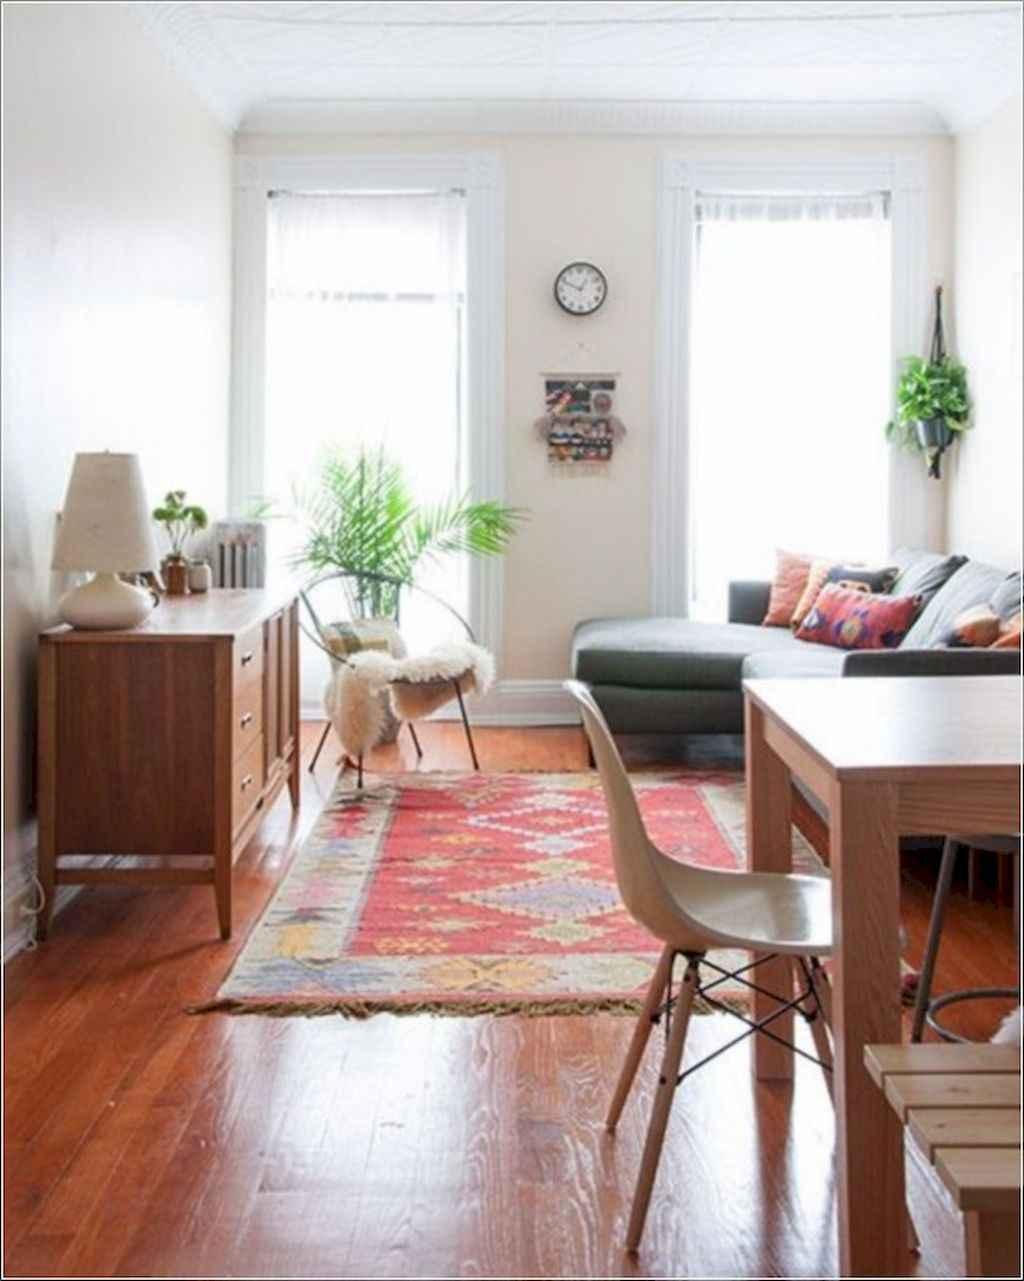 Simple clean vintage living room decorating ideas (32)